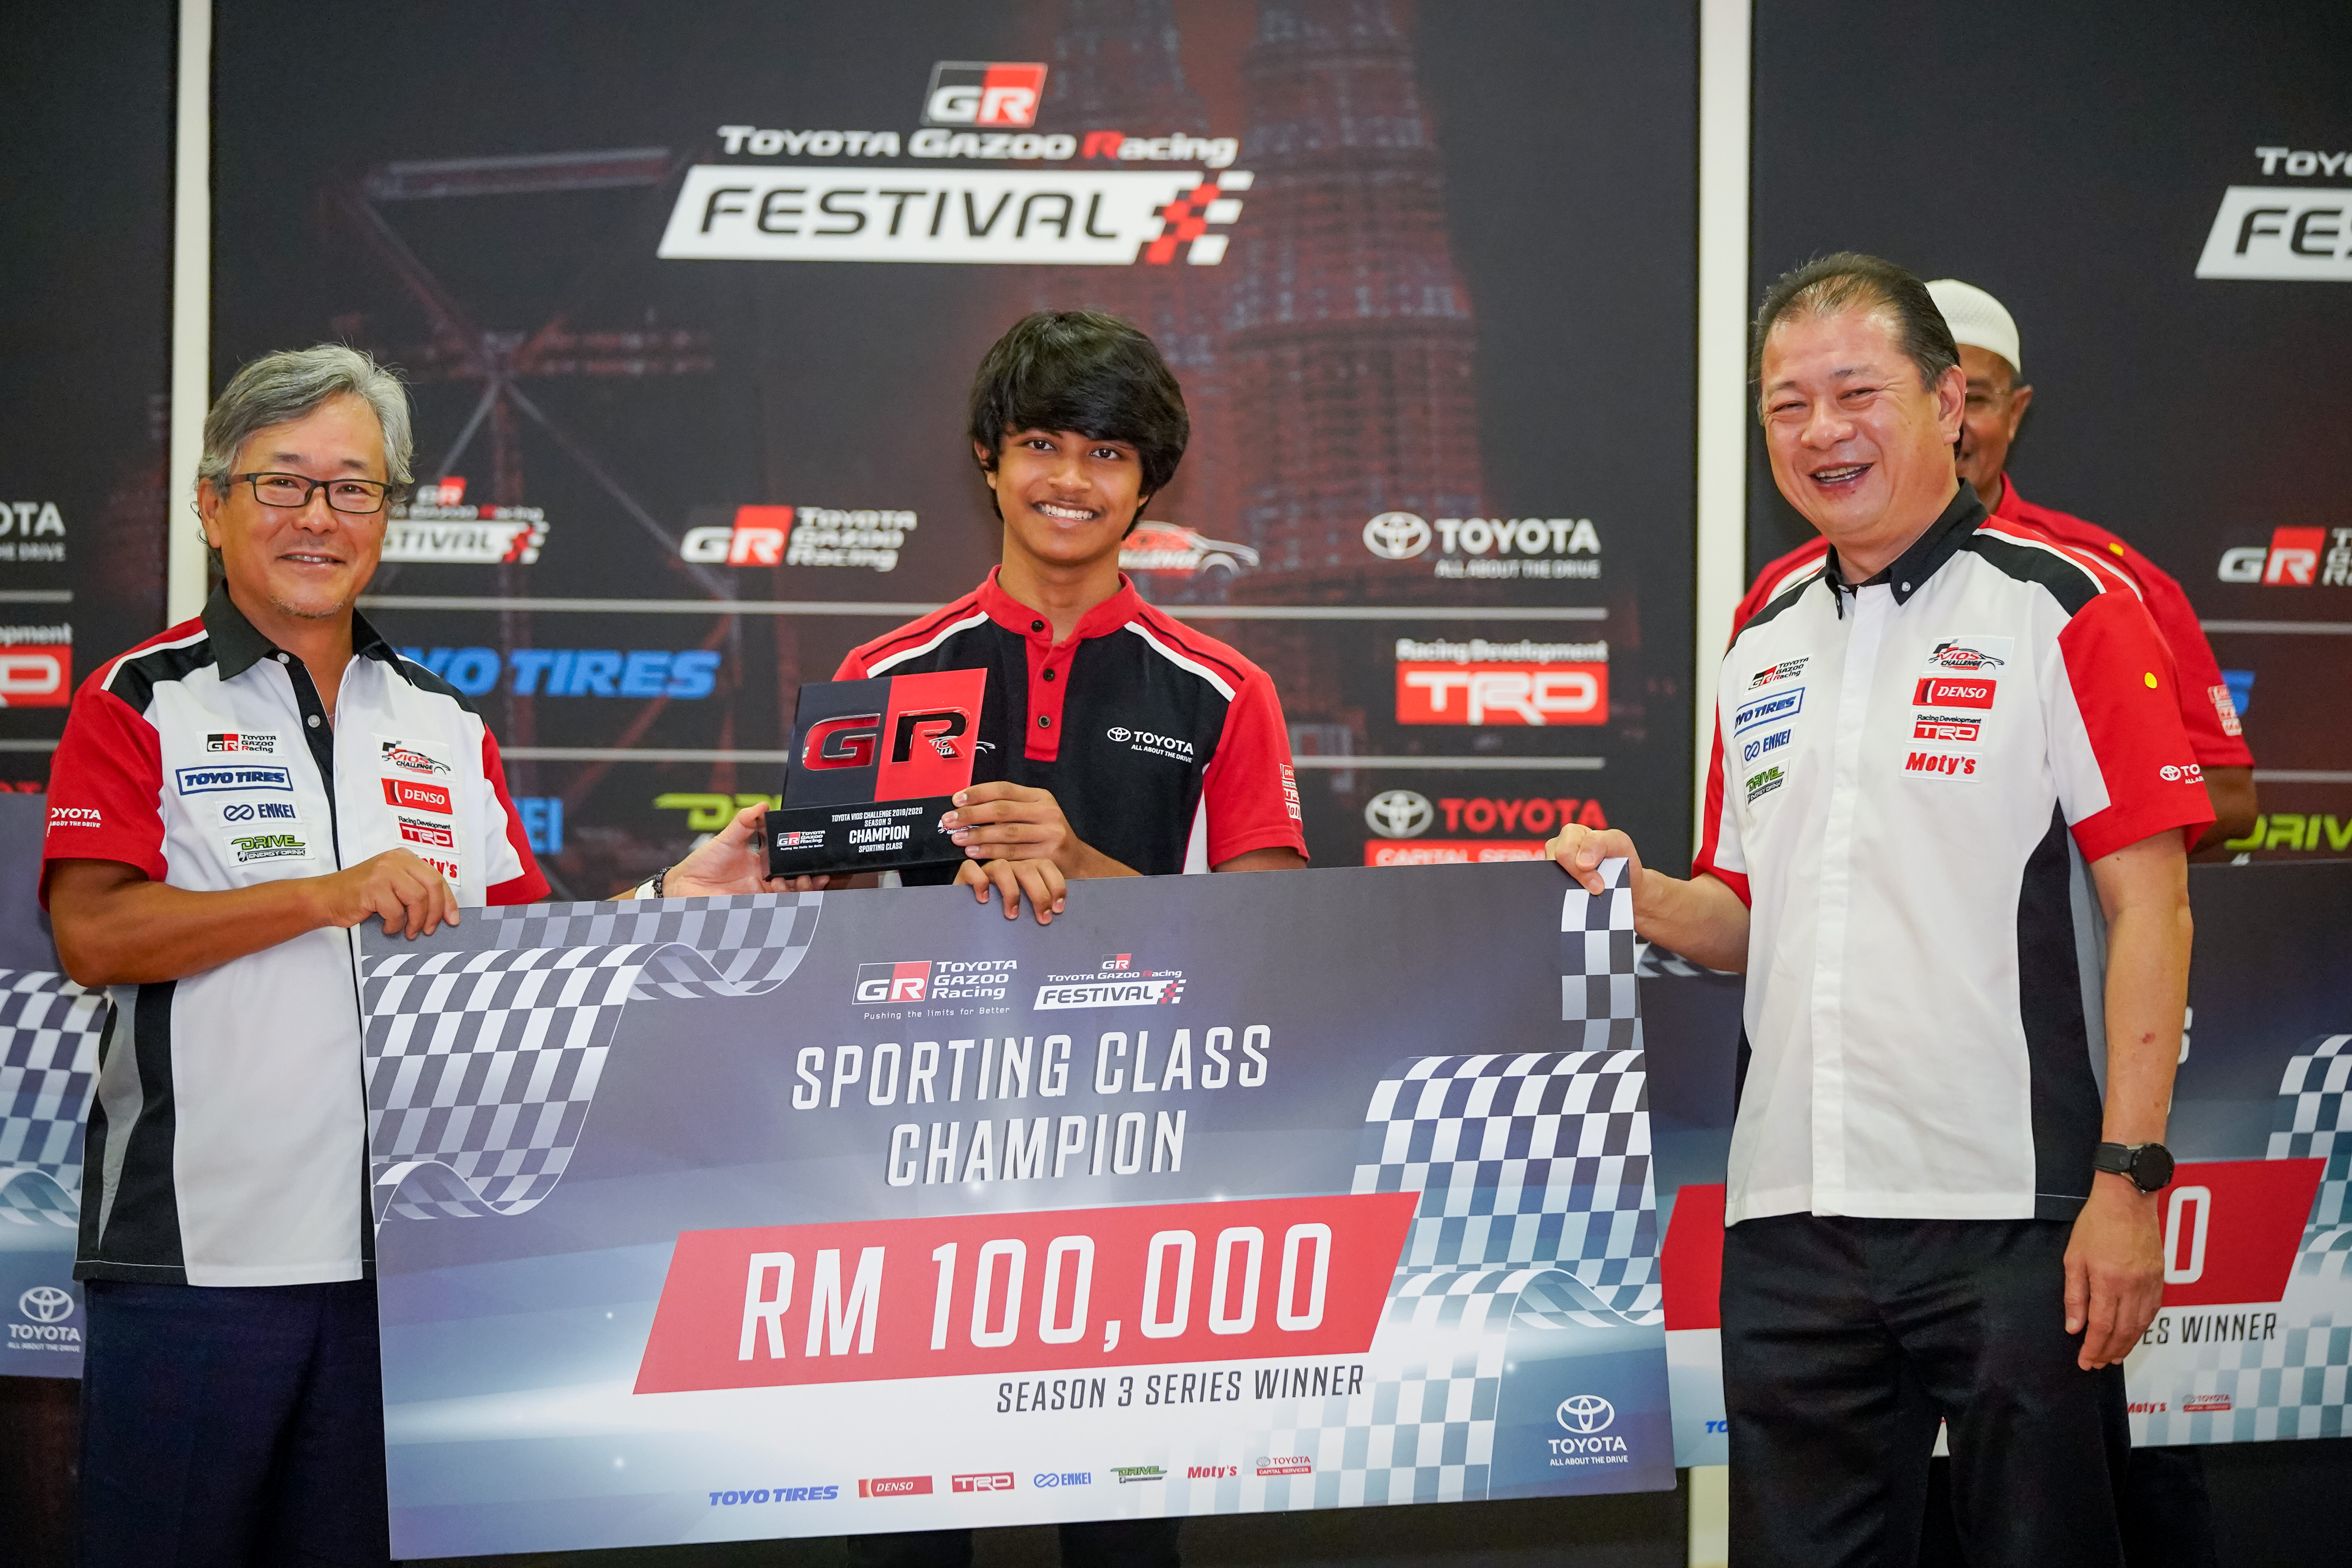 TGR Toyota Vios Challenge Season 3